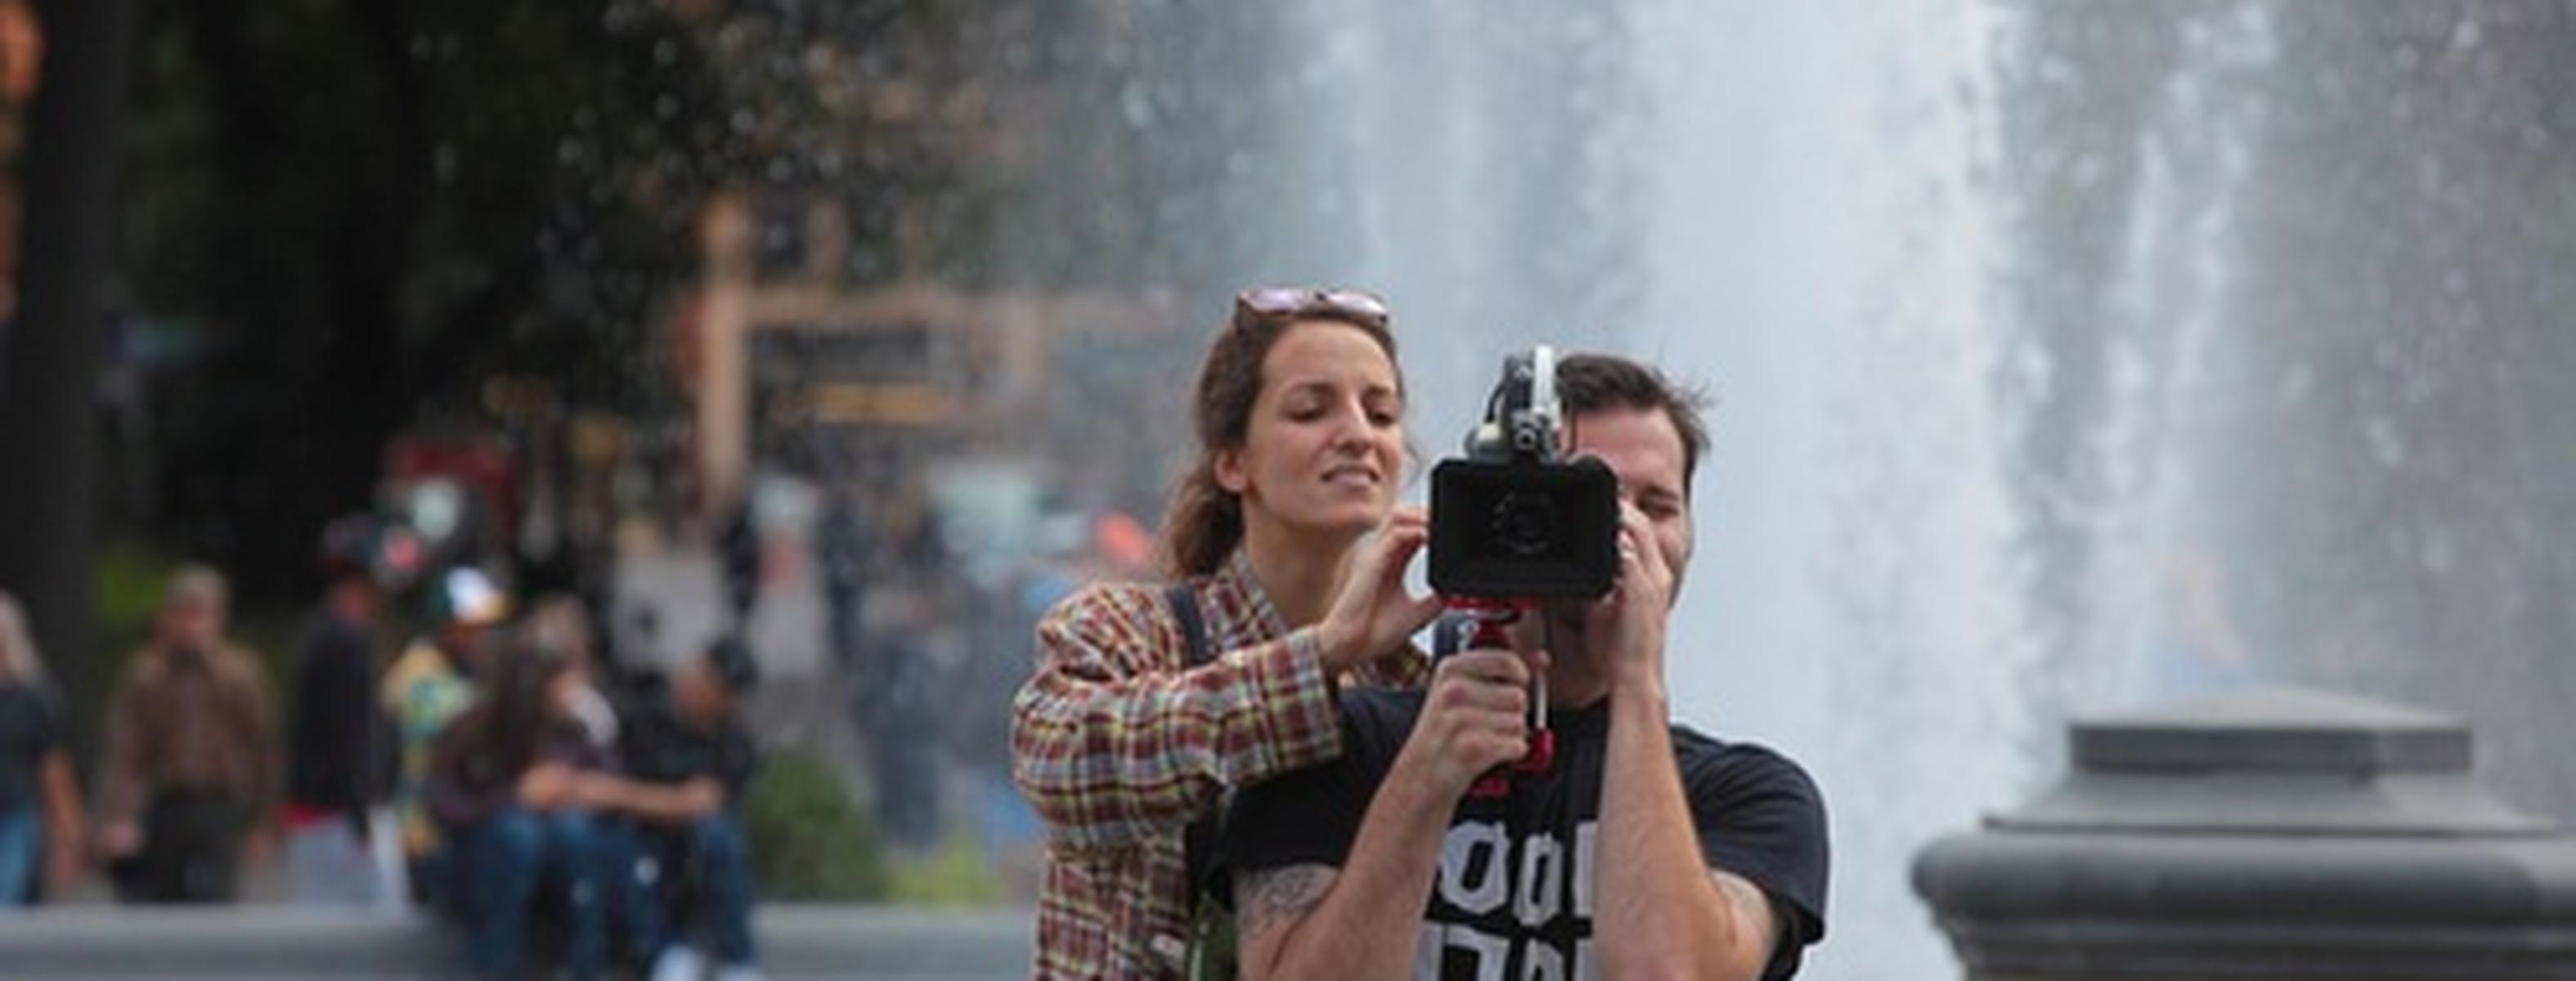 5 Film Schools with Great Summer Programs